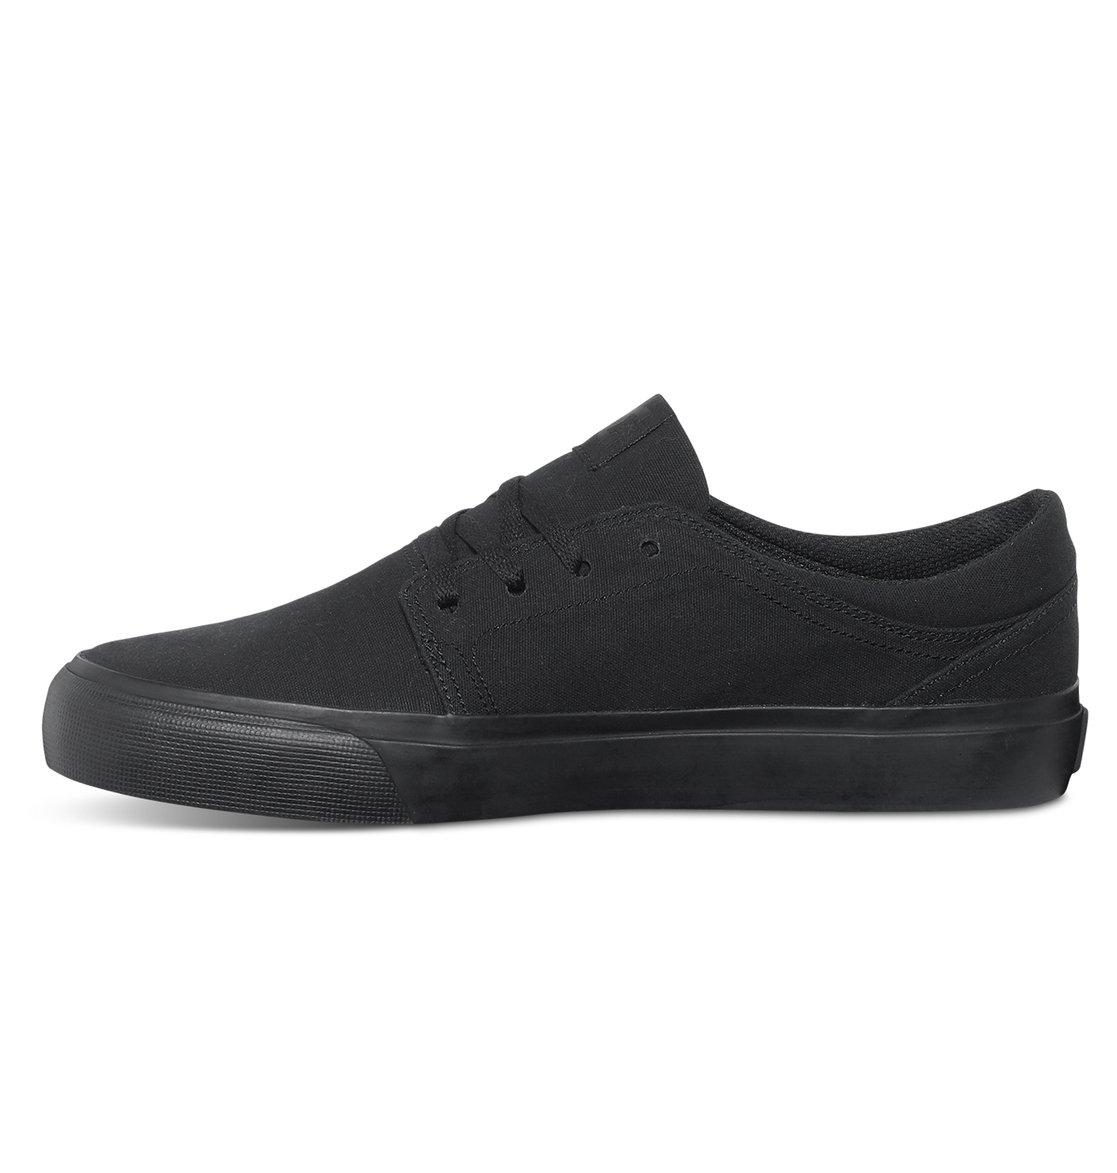 1117x1173 Men's Trase Tx Shoes Adys300126 Dc Shoes